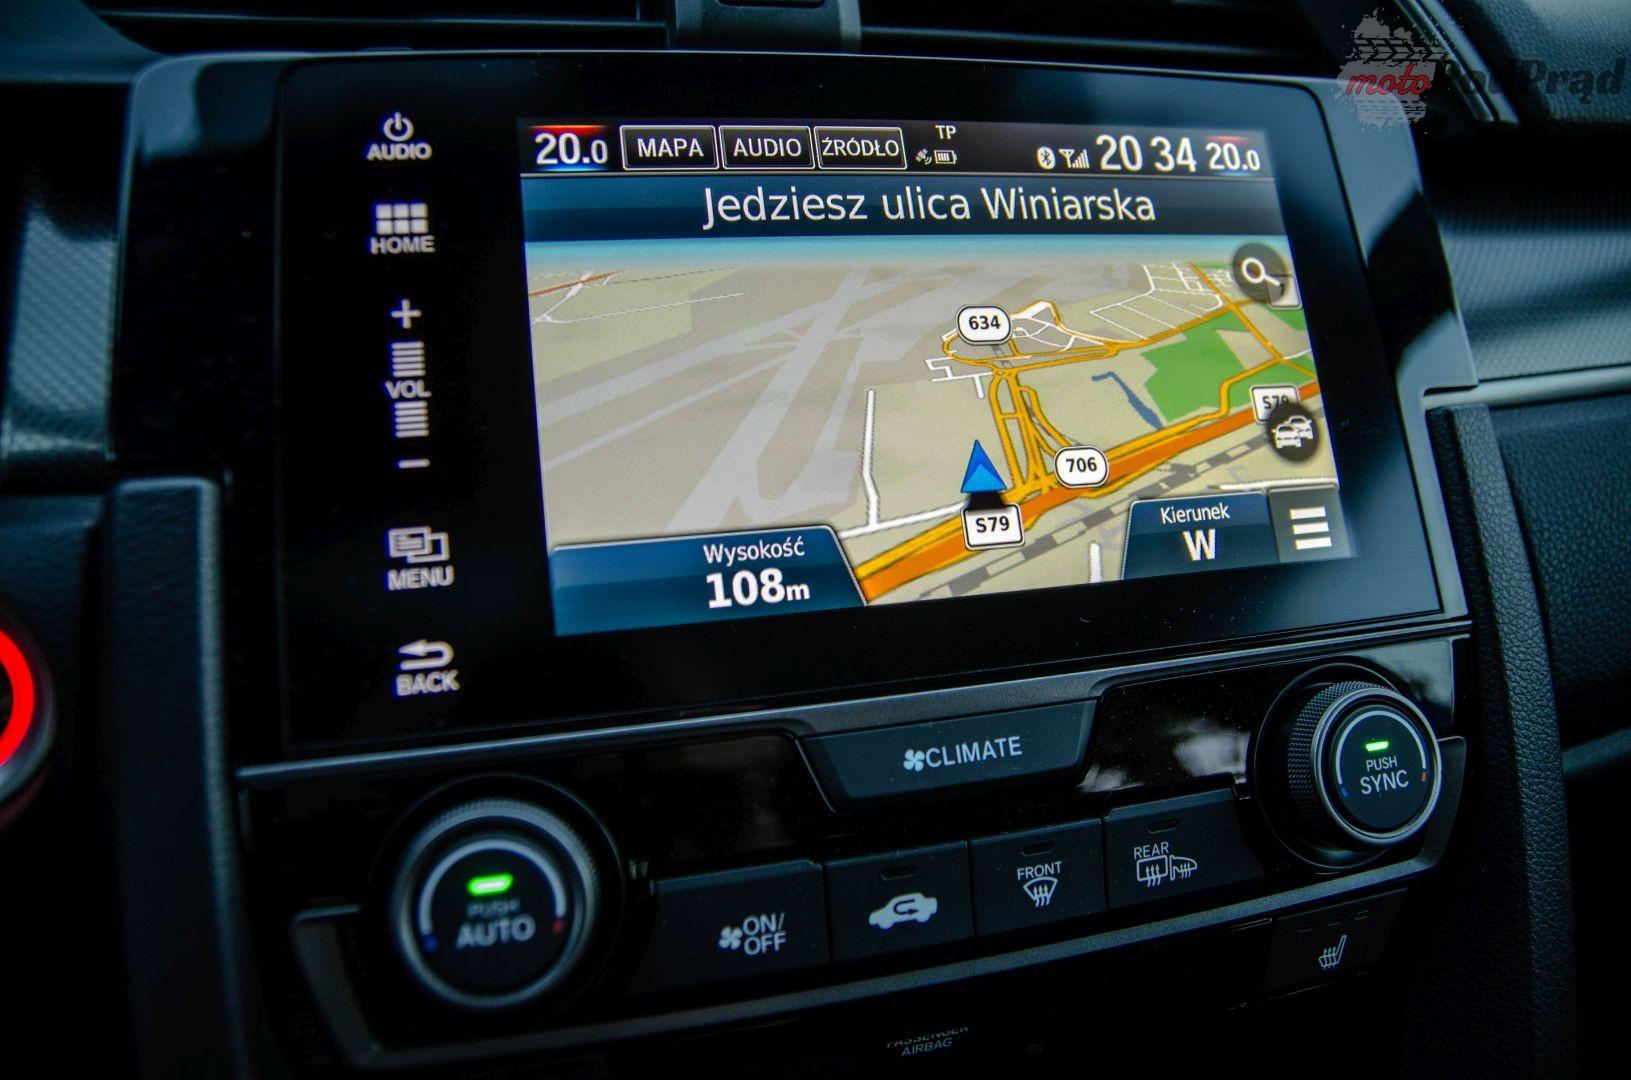 Honda Civic 1 14 Test: Honda Civic X 1.5 VTEC Turbo CVT 5D – stara miłość nie rdzewieje?